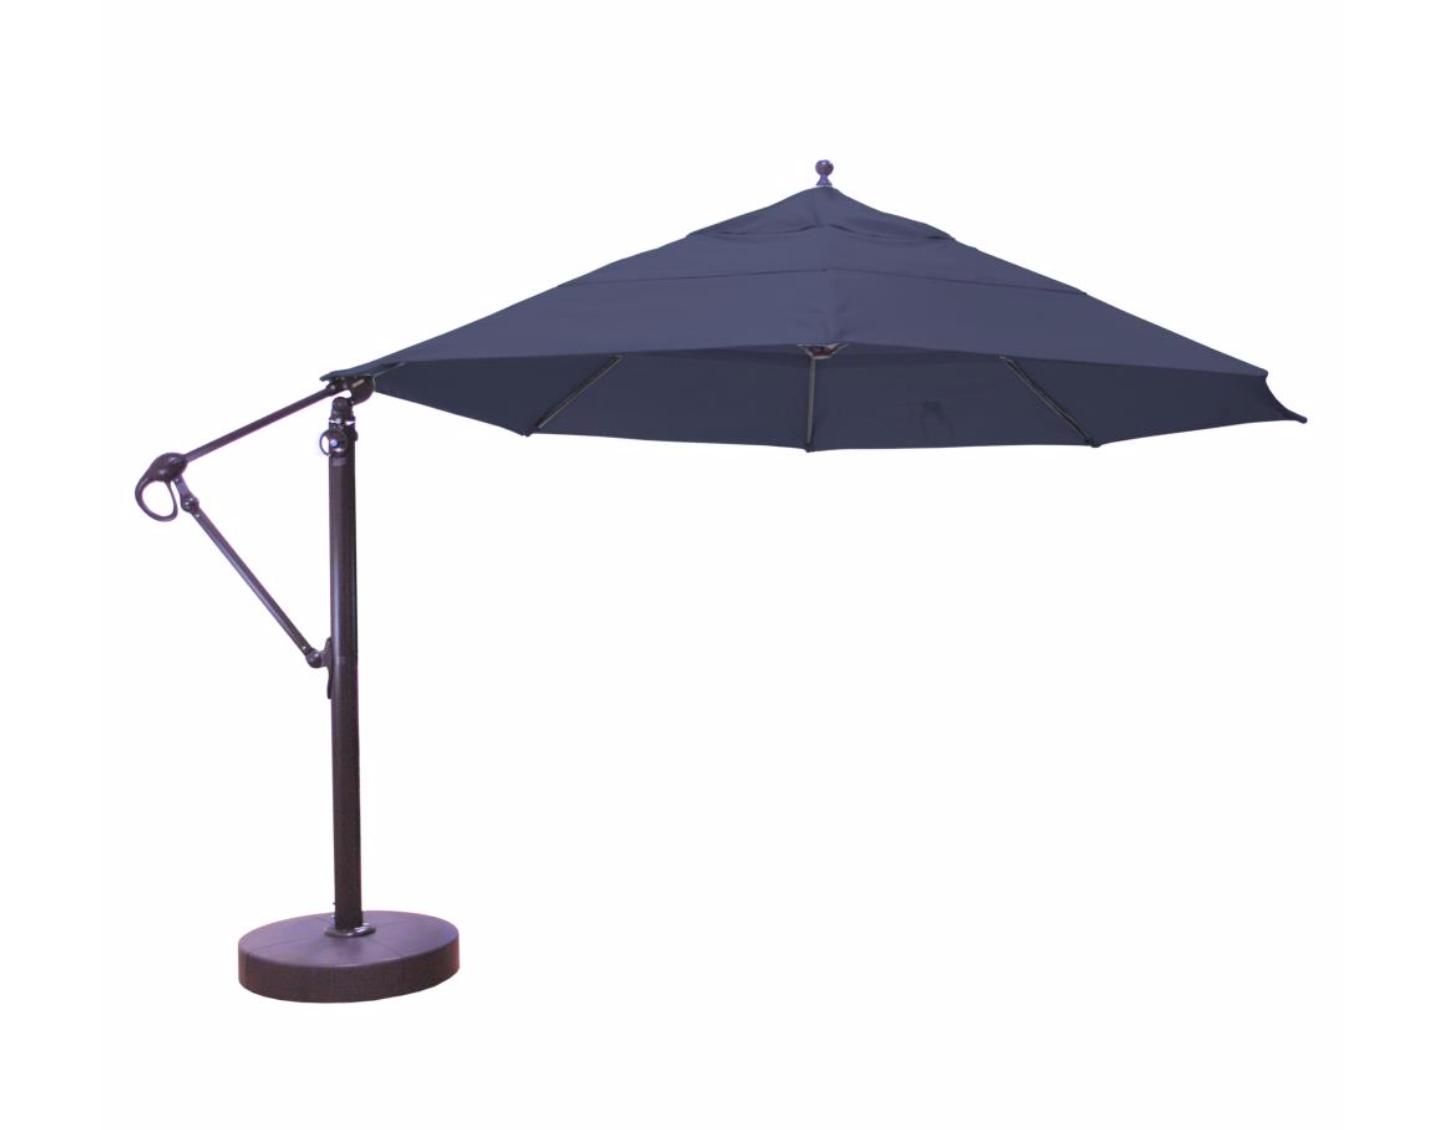 13' Cantilever Round Umbrella Patio umbrella, Canopy